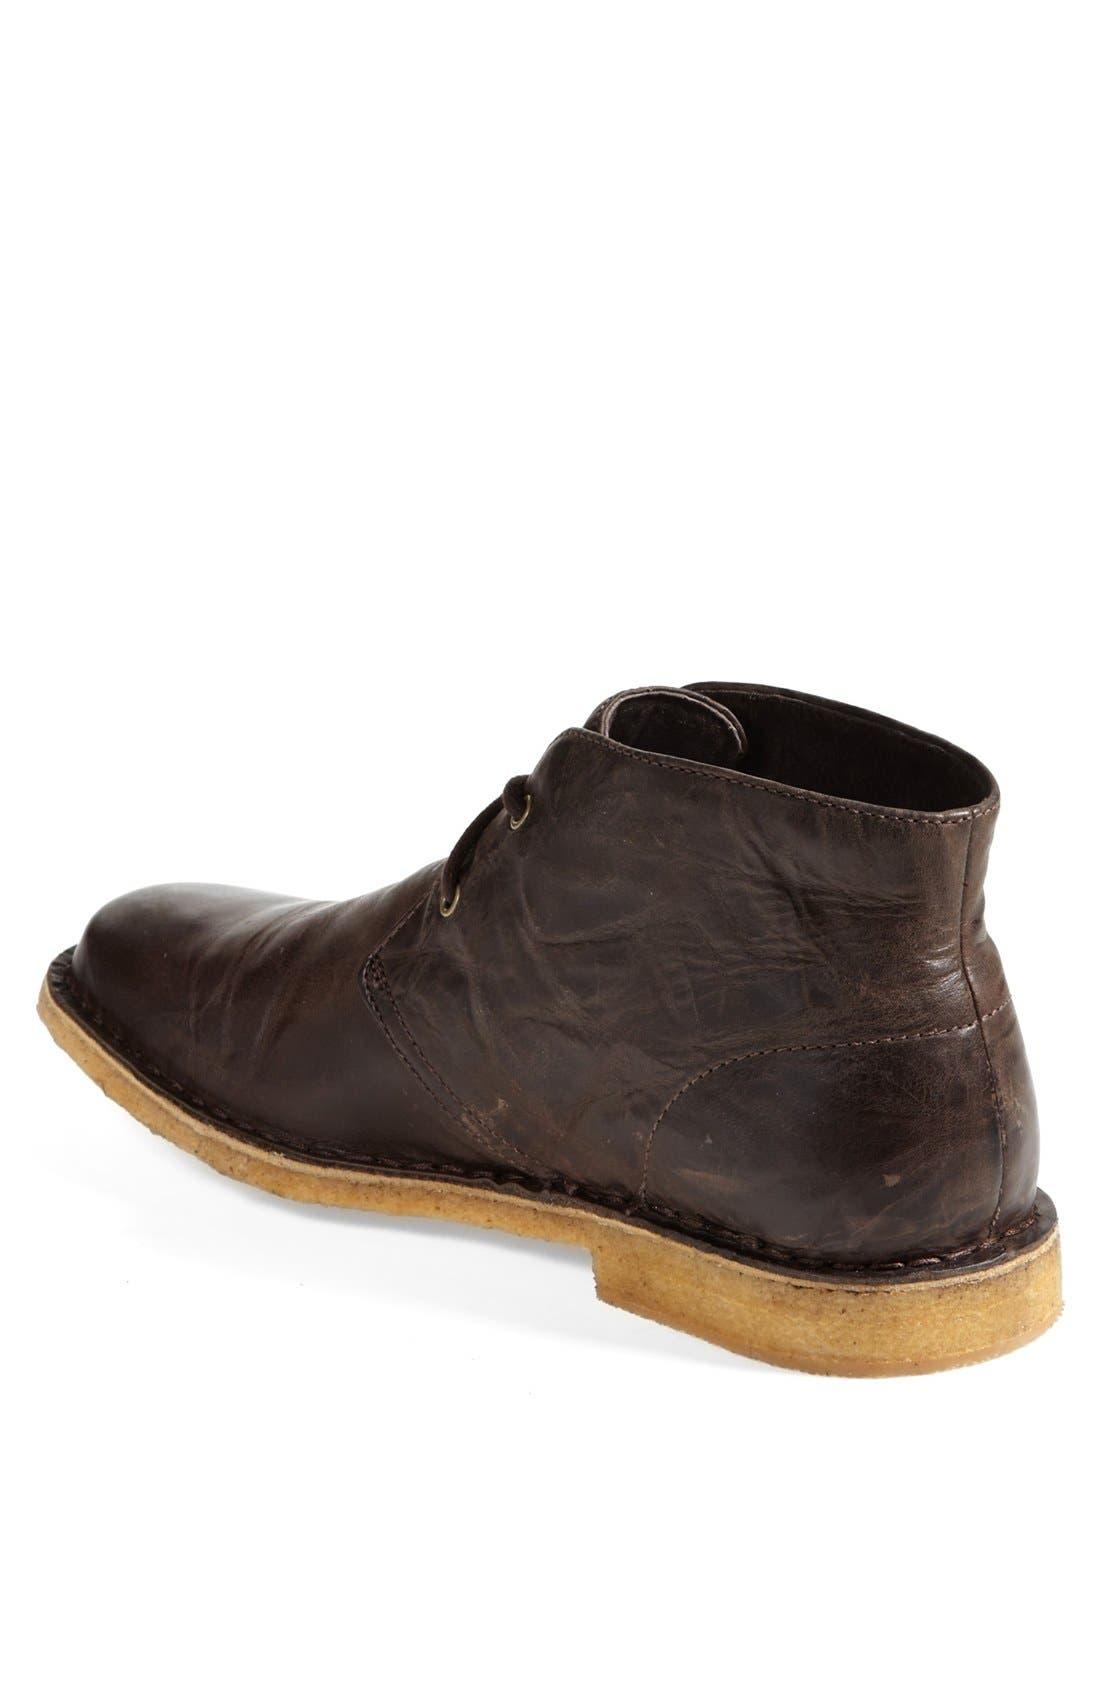 Alternate Image 2  - UGG® Leighton Chukka Boot (Men)